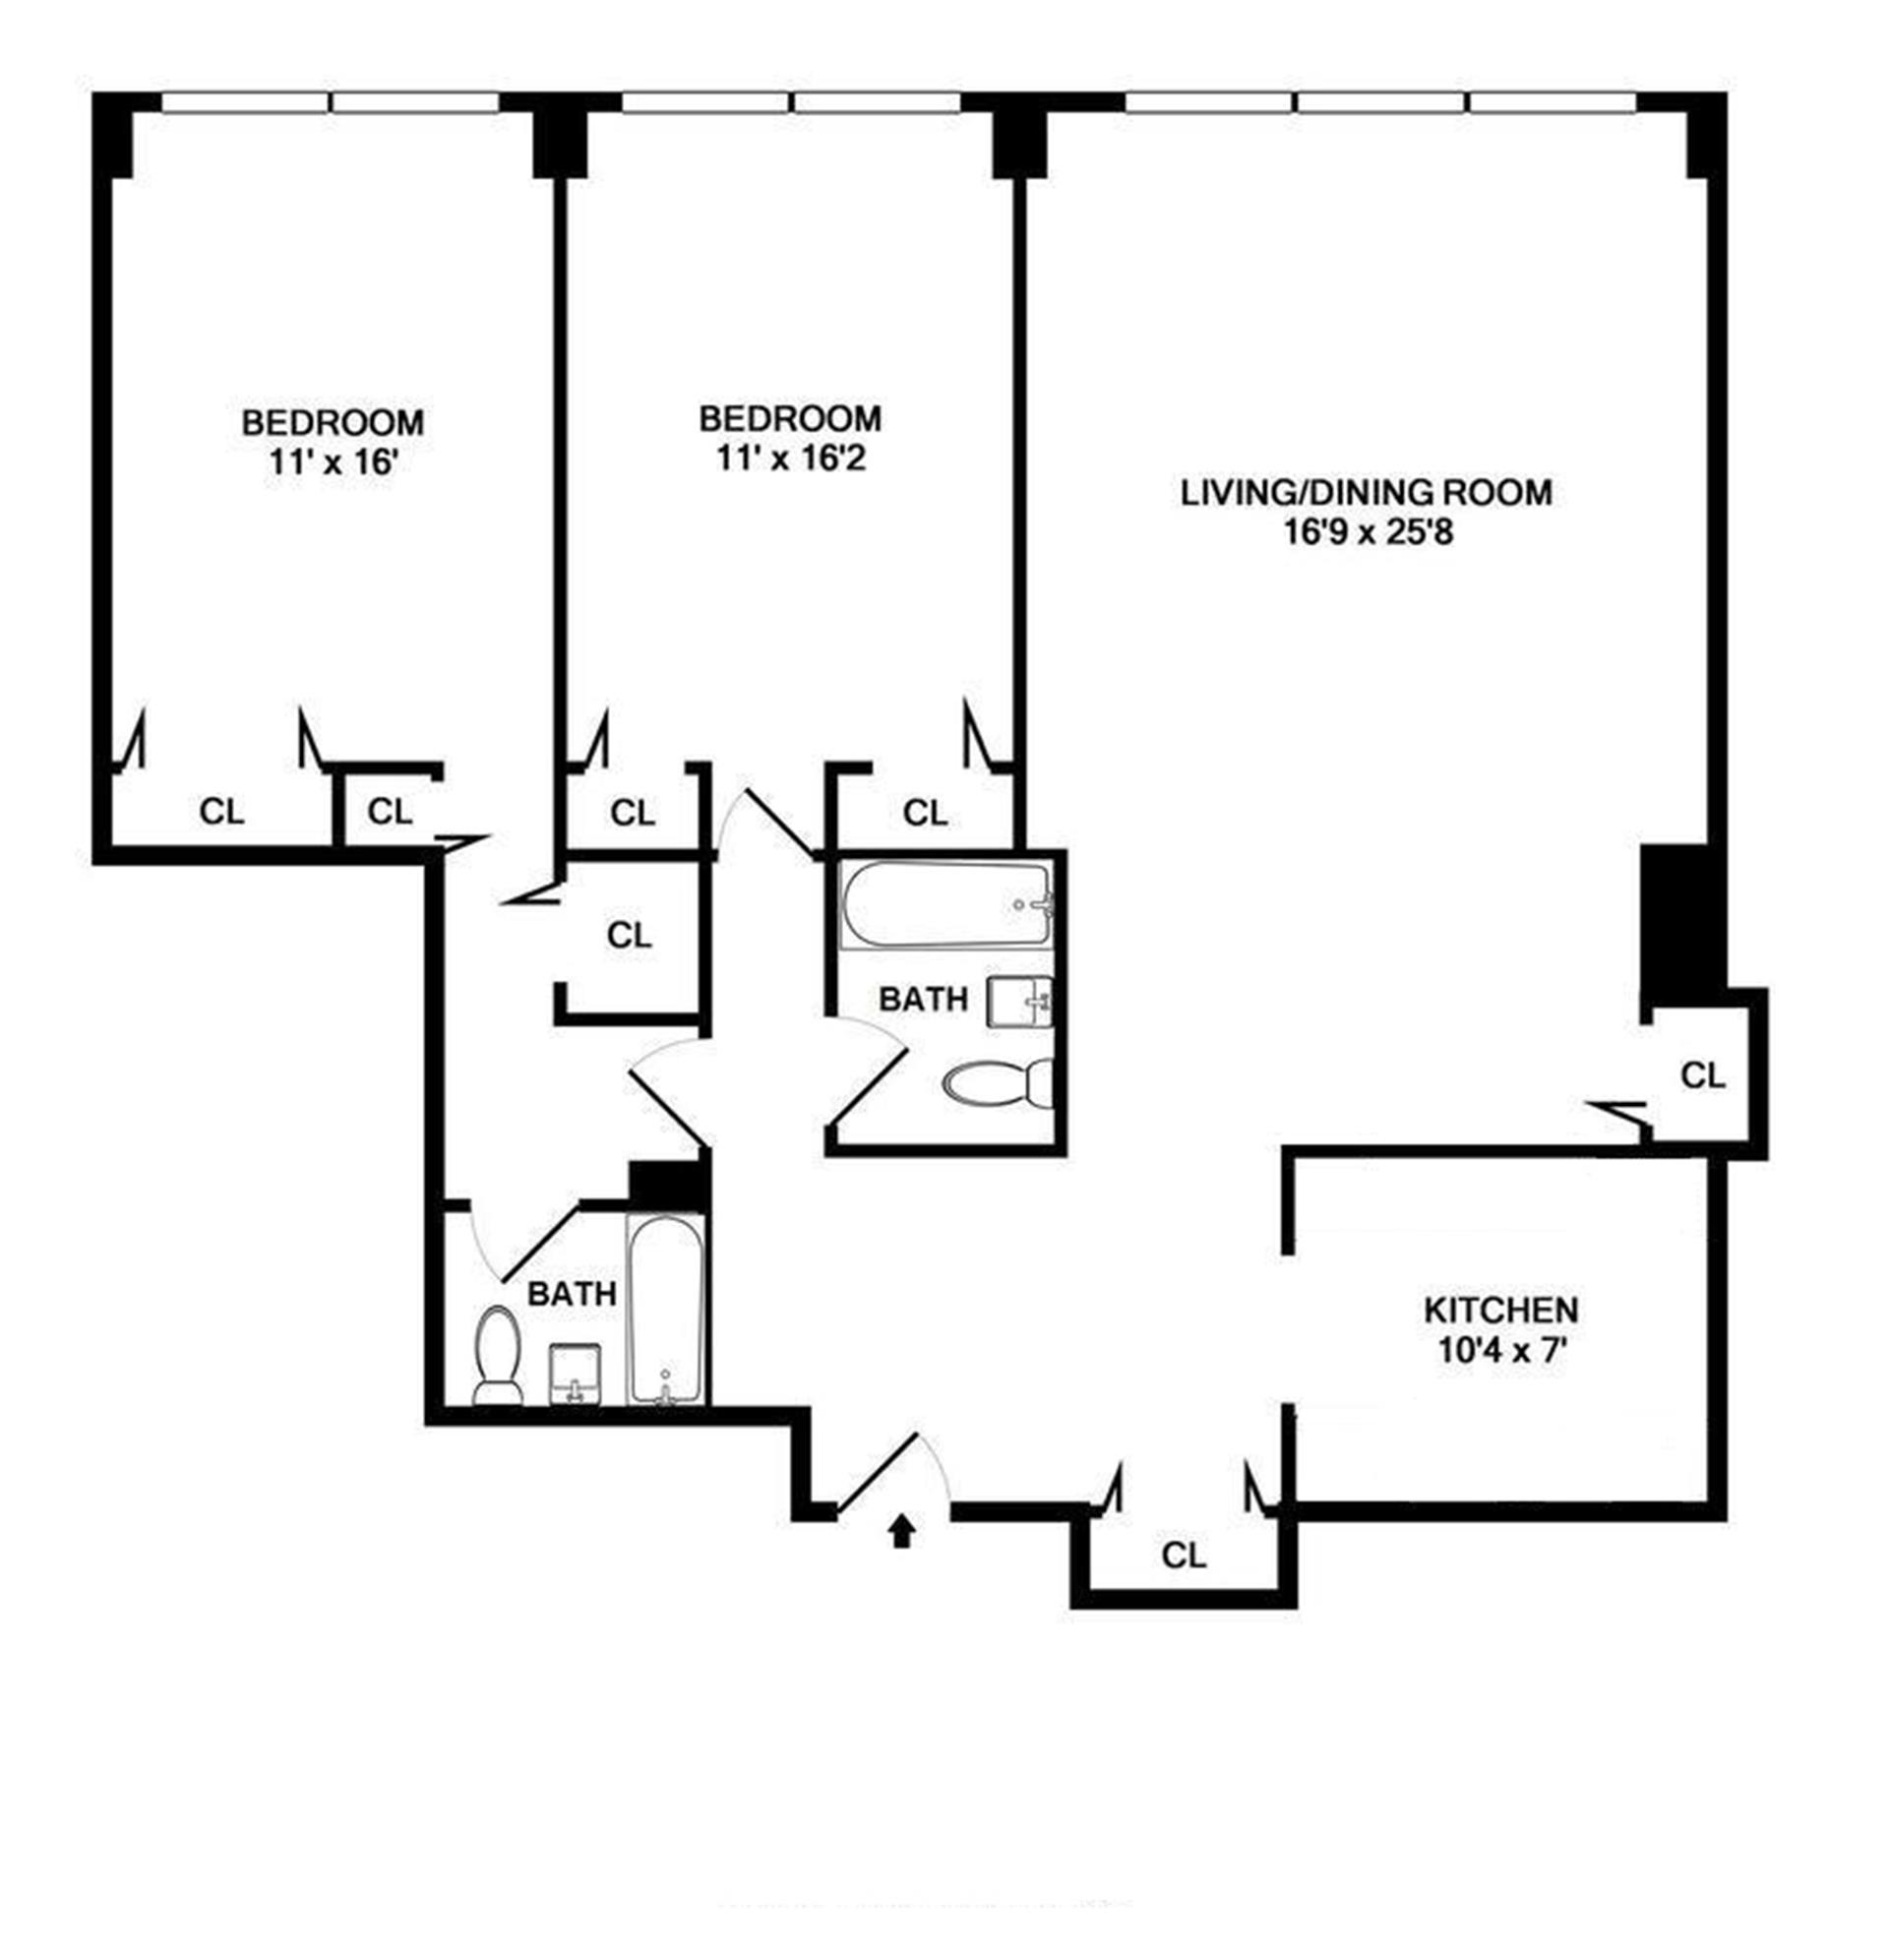 Floor plan of KIPS BAY TOWERS, 333 East 30th Street, 15C - Kips Bay, New York